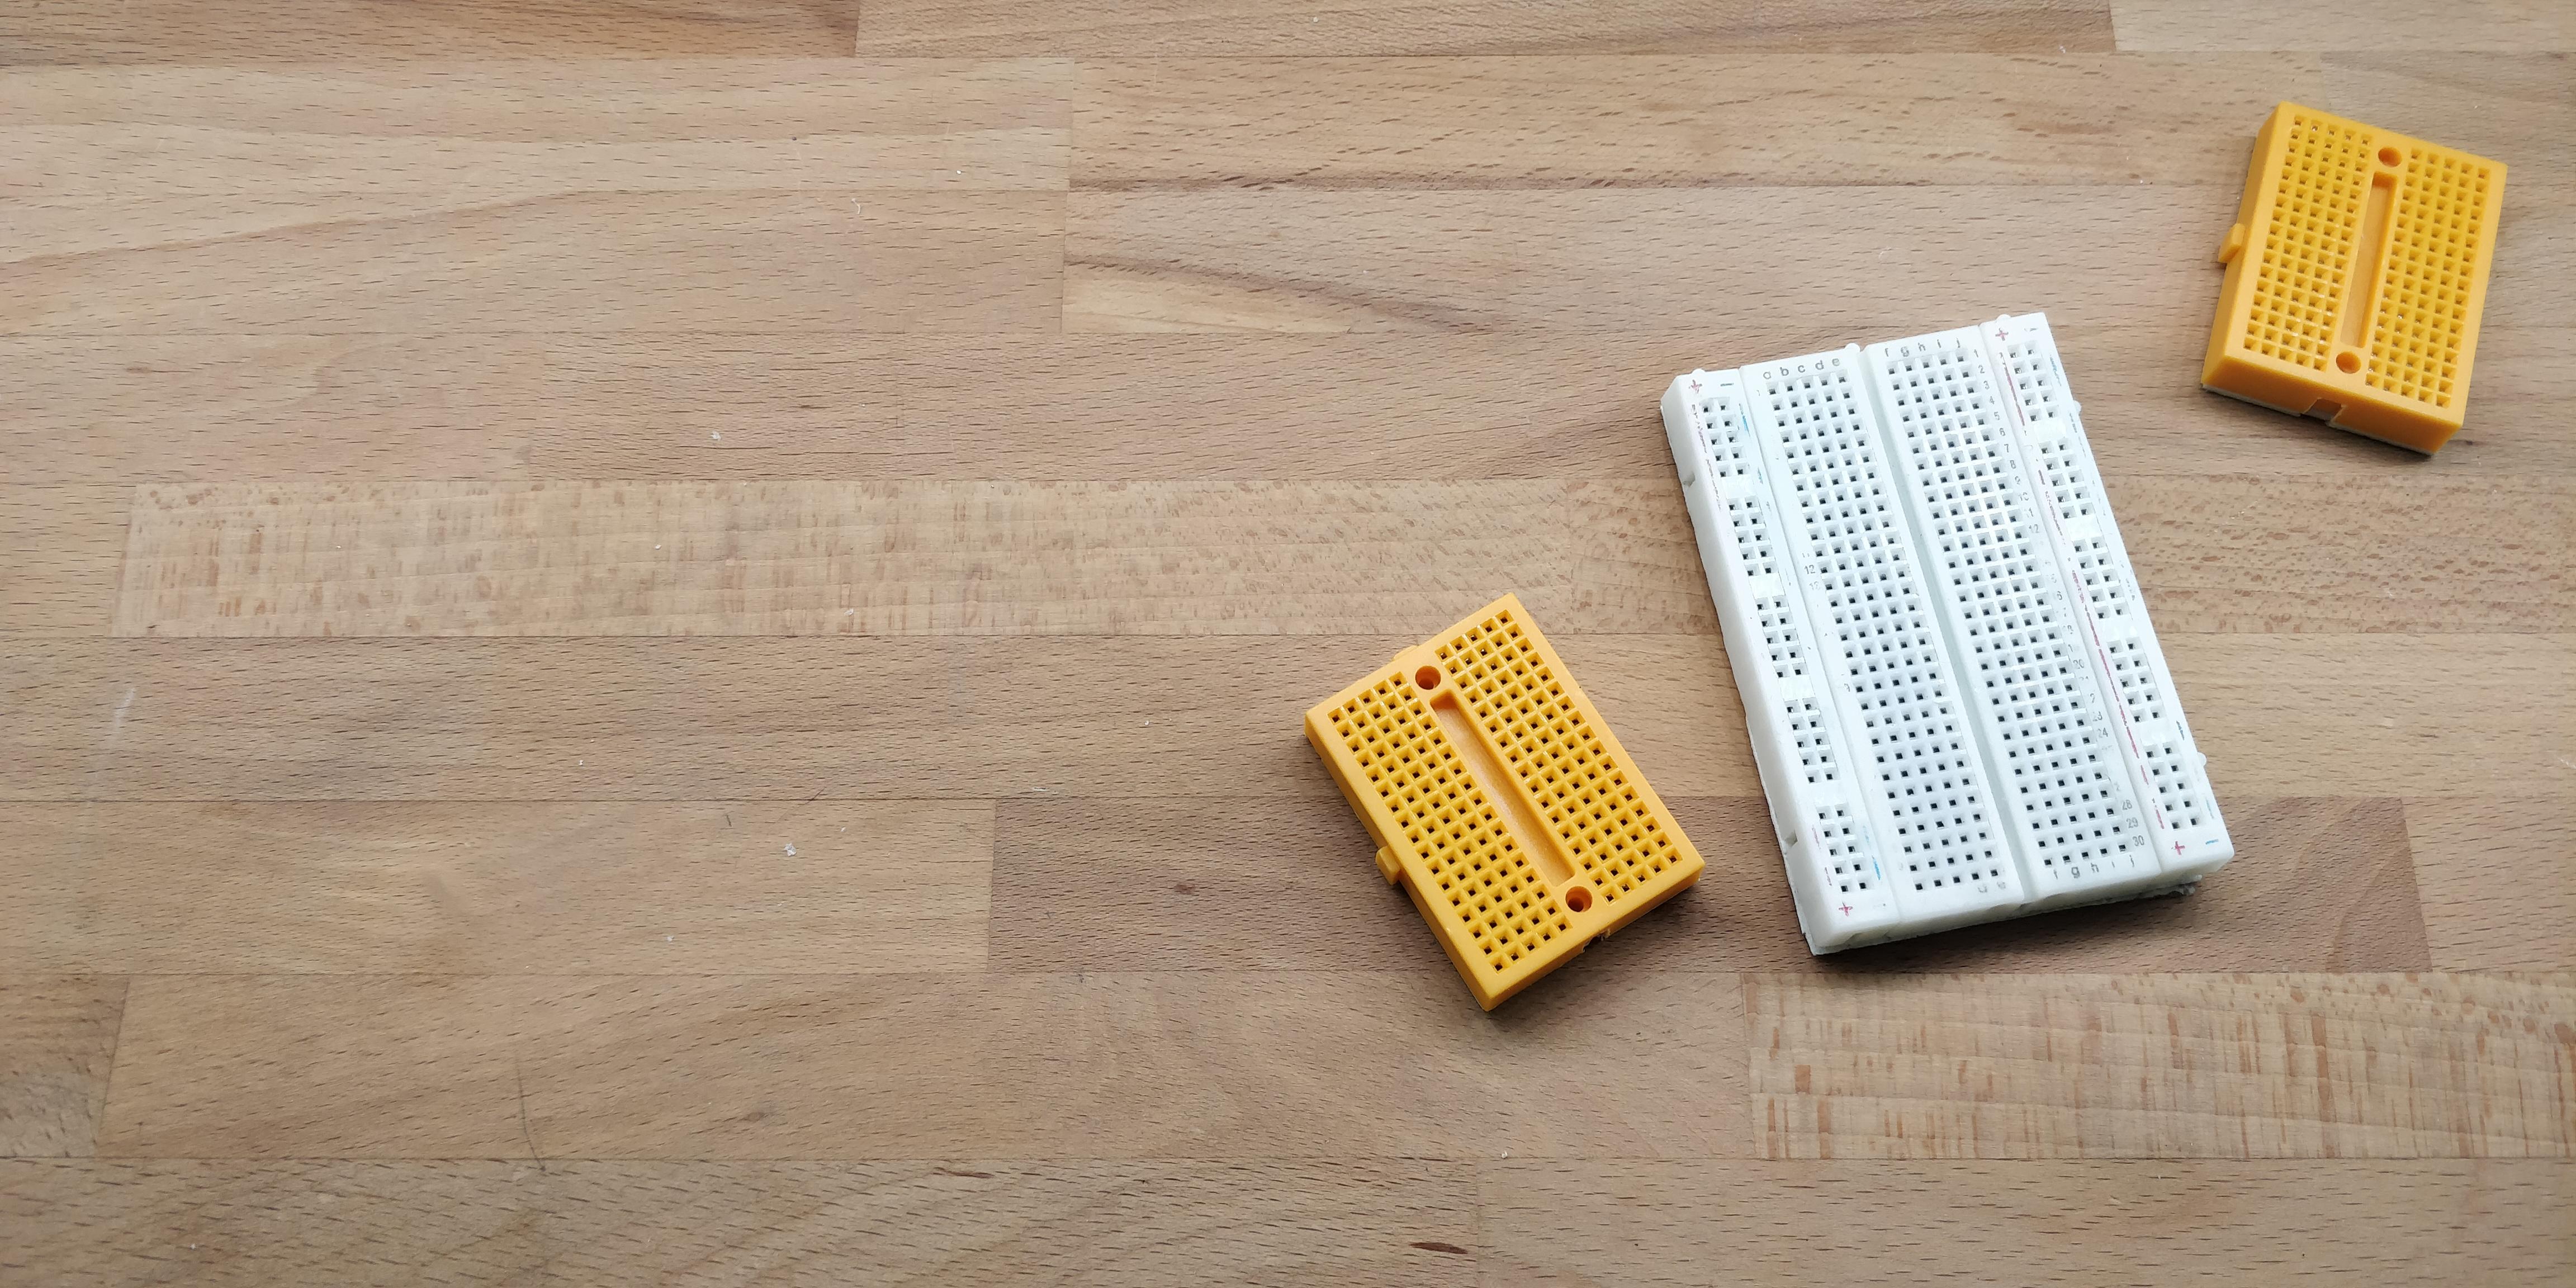 Component – Breadboard